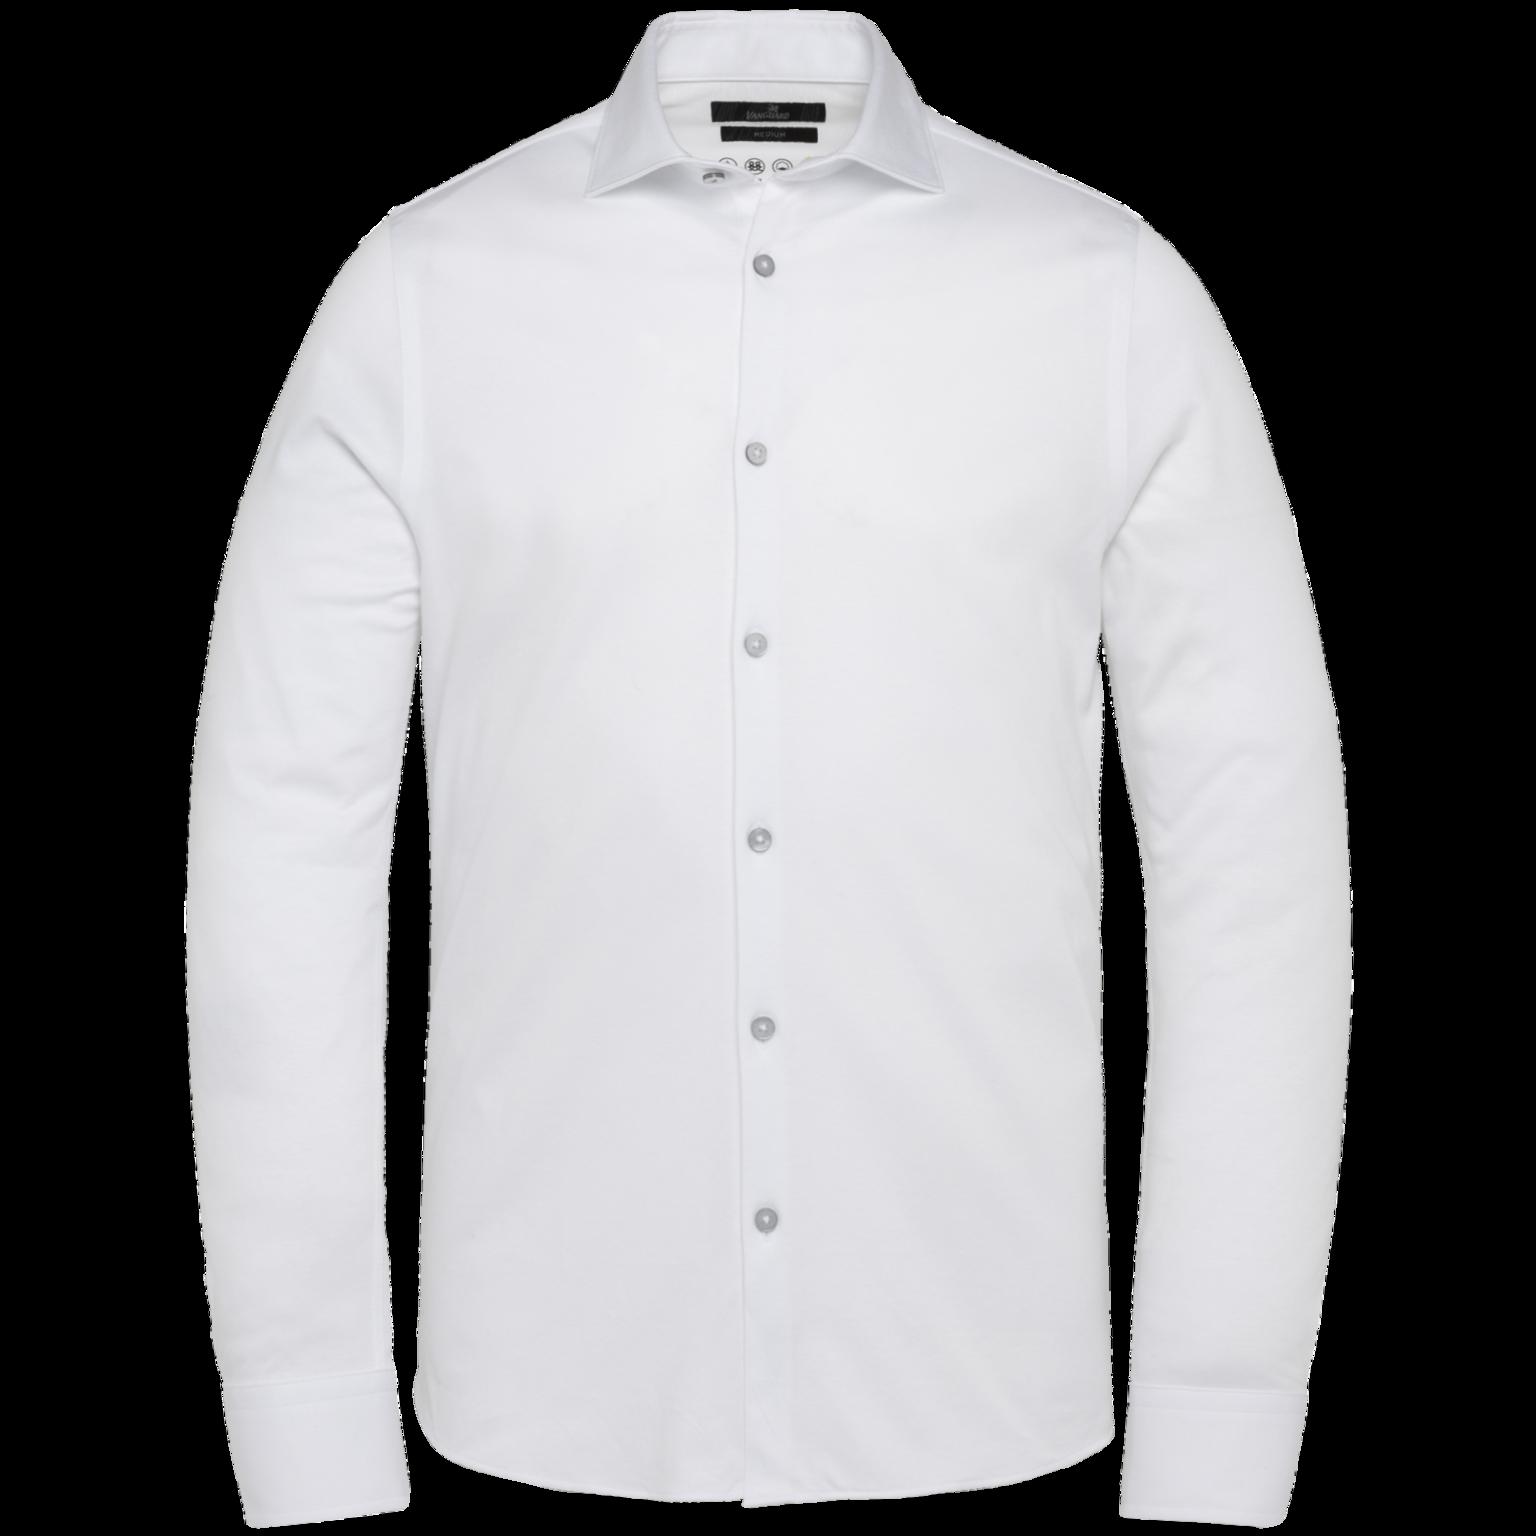 VANGUARD chemise longues manches jersey-1